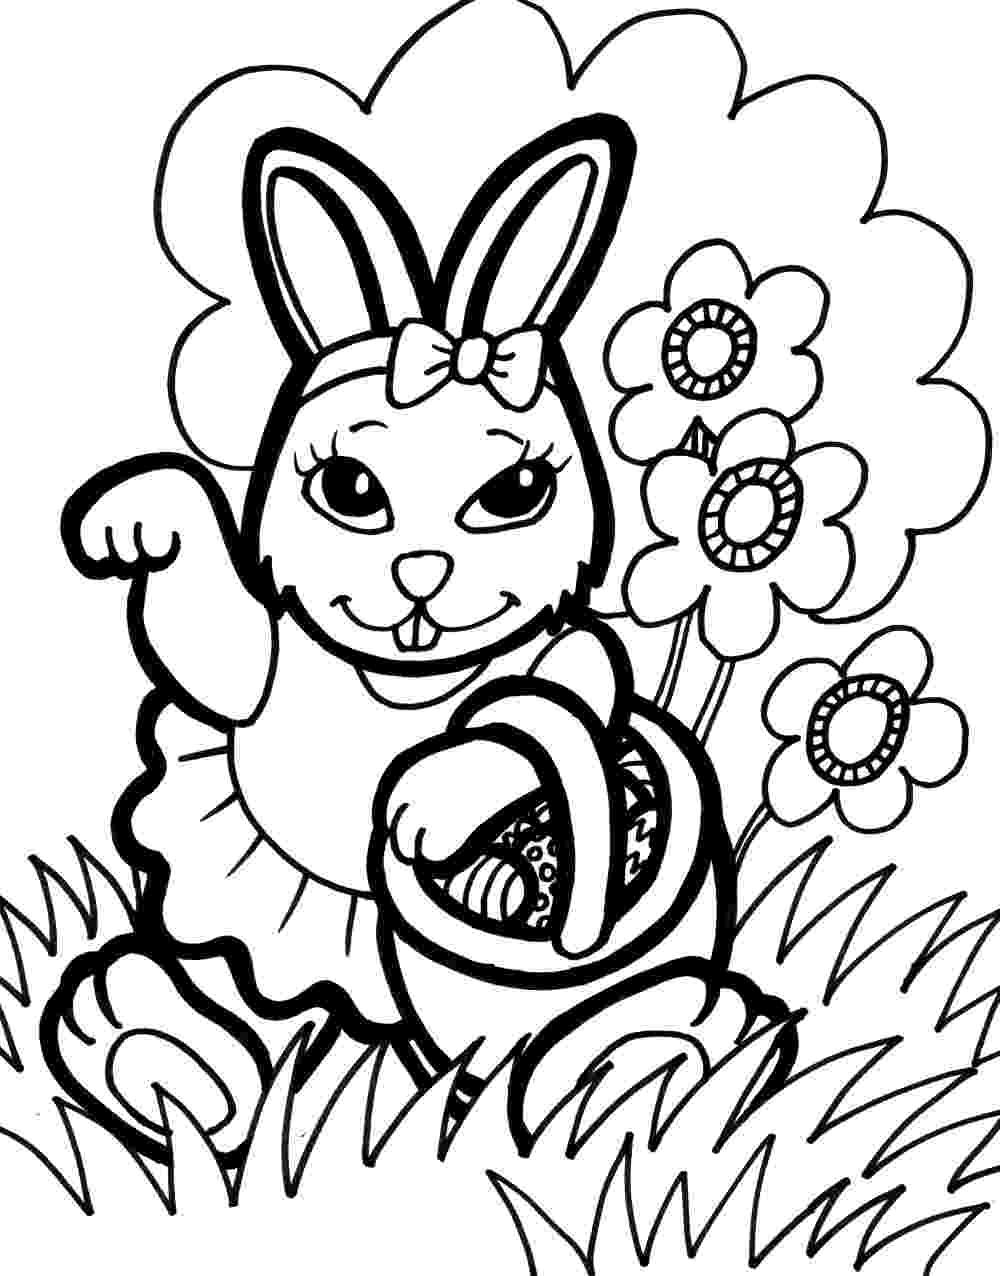 bunny coloring sheets free printable bunny coloring pages best coloring pages for kids free bunny coloring printable sheets